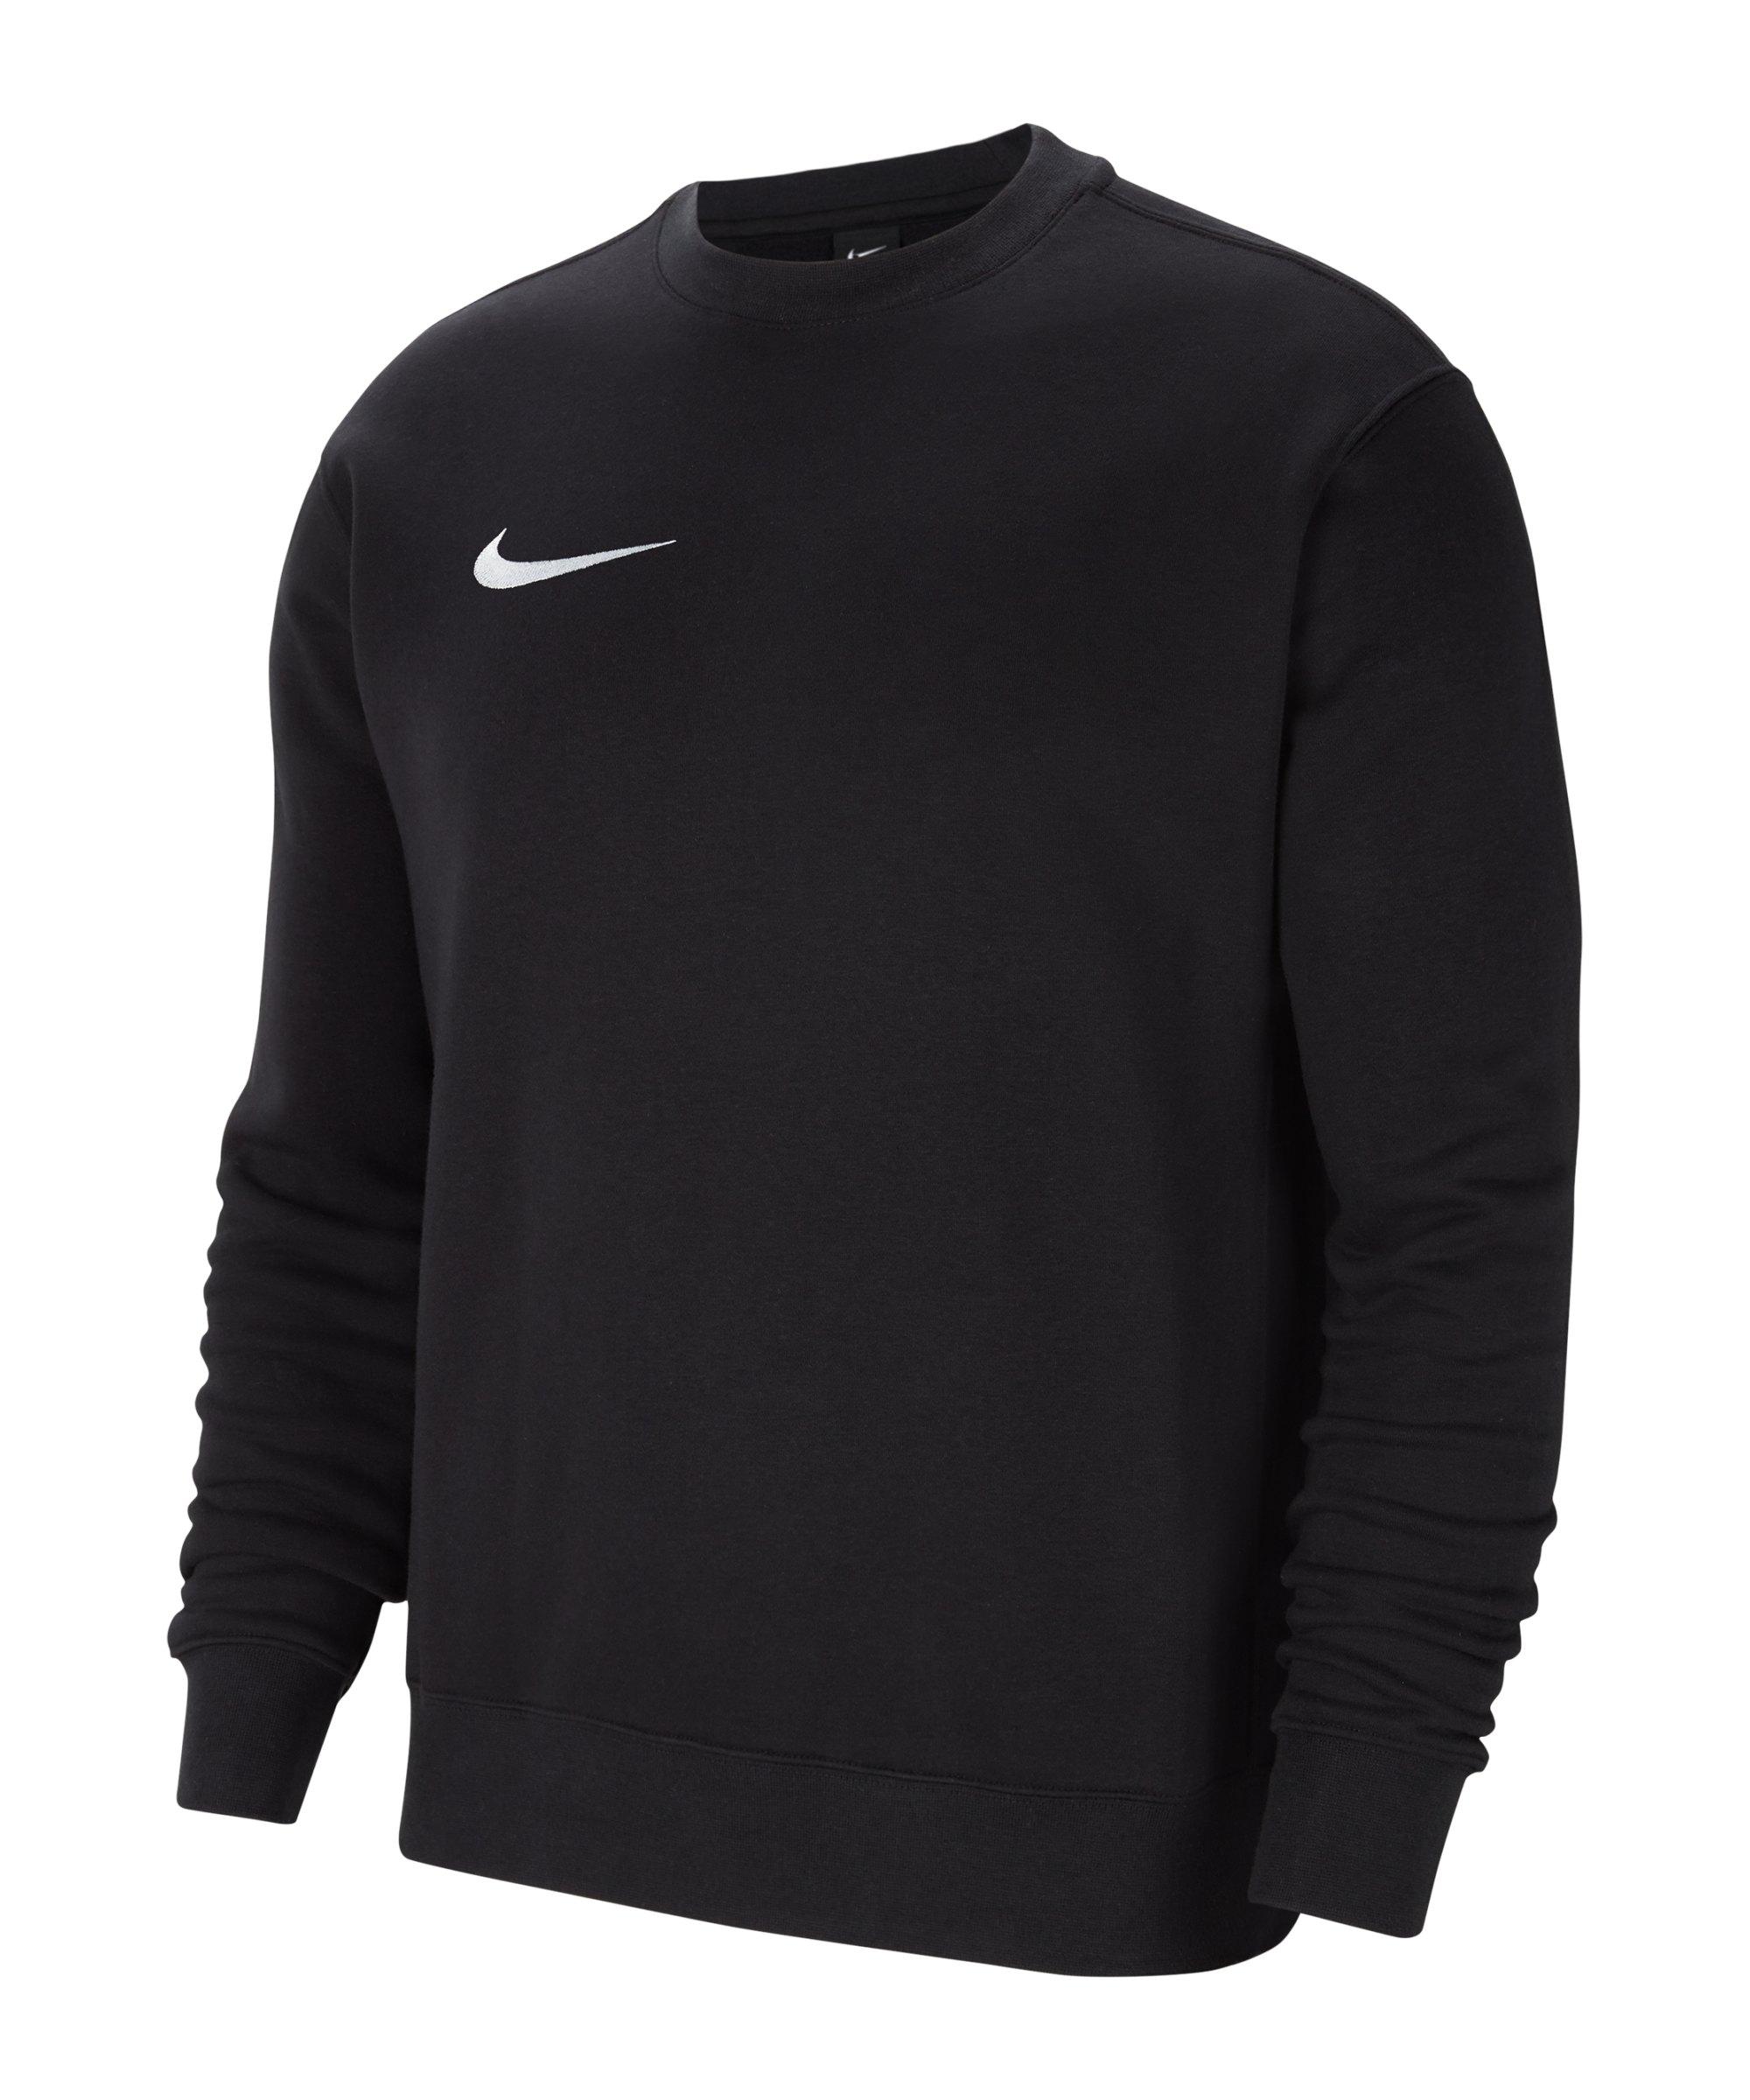 Nike Park 20 Fleece Sweatshirt Schwarz Weiss F010 - schwarz